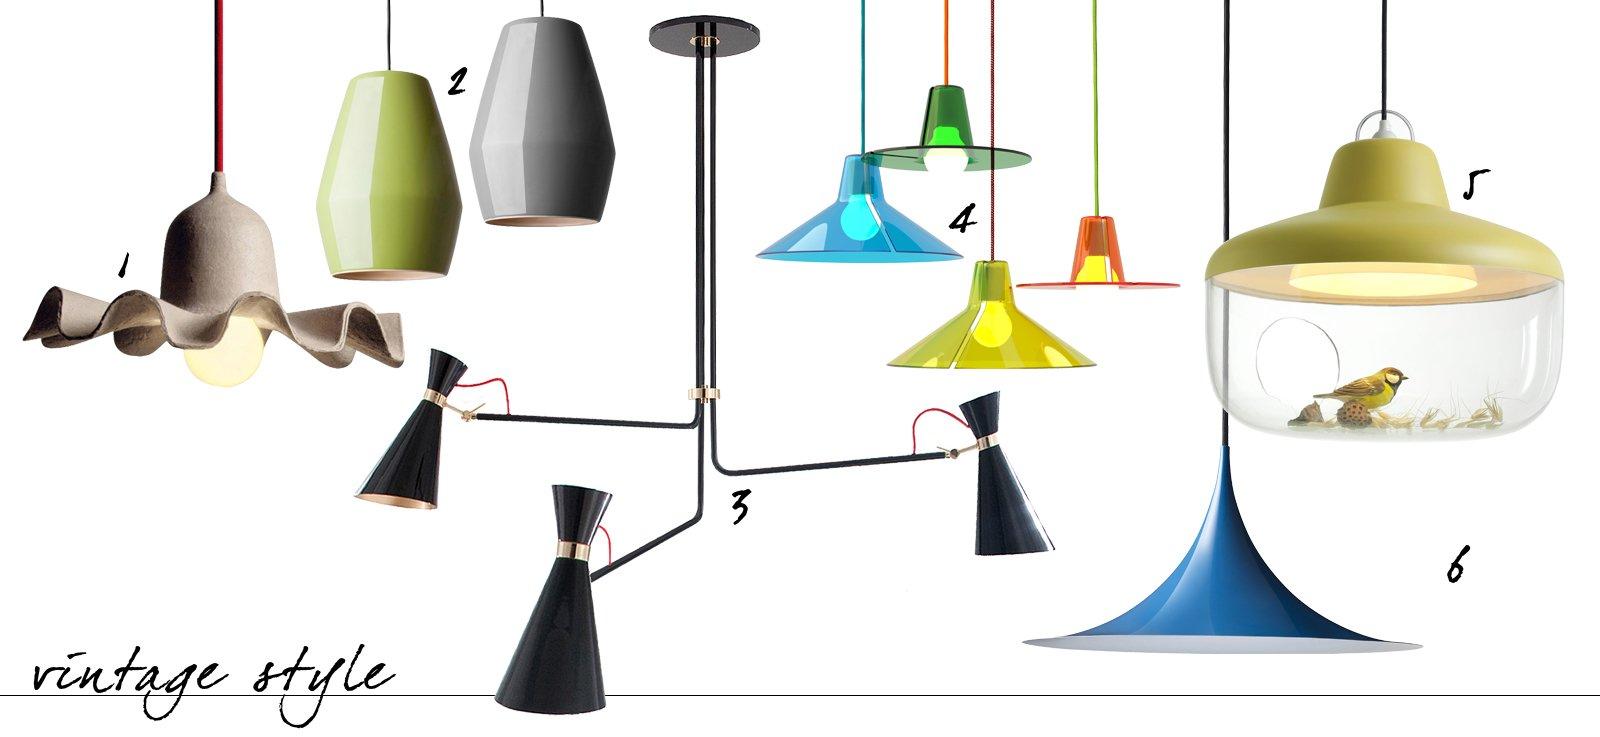 Lampade e lampadari a sospensione in tre stili diversi - Cose di Casa